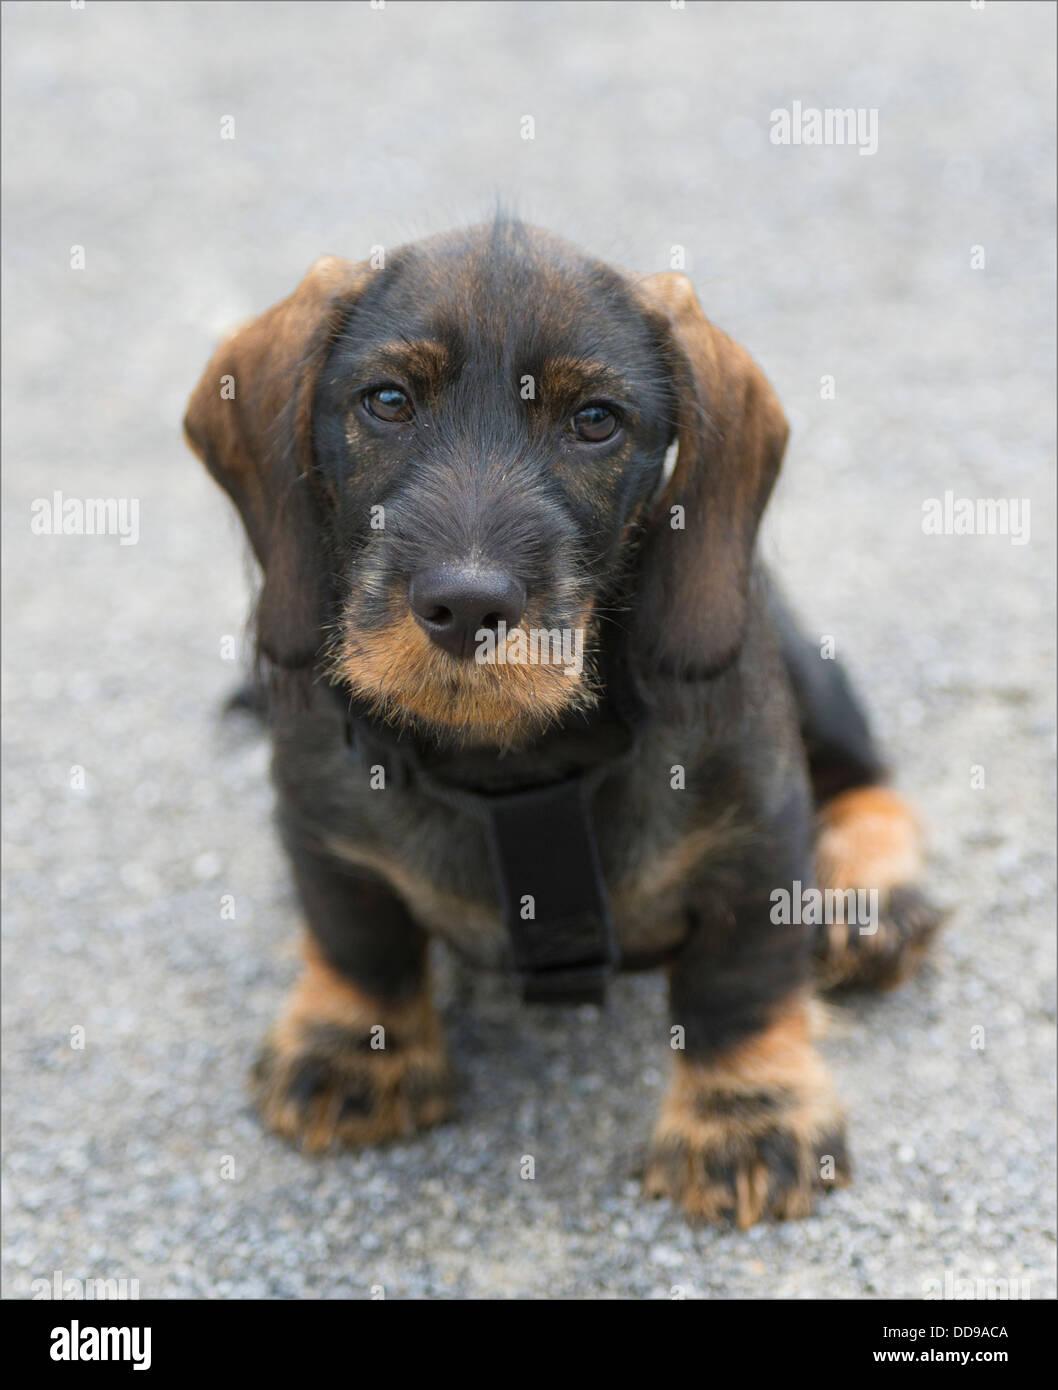 Dachshund 12 Week Old Puppy Sitting - Stock Image